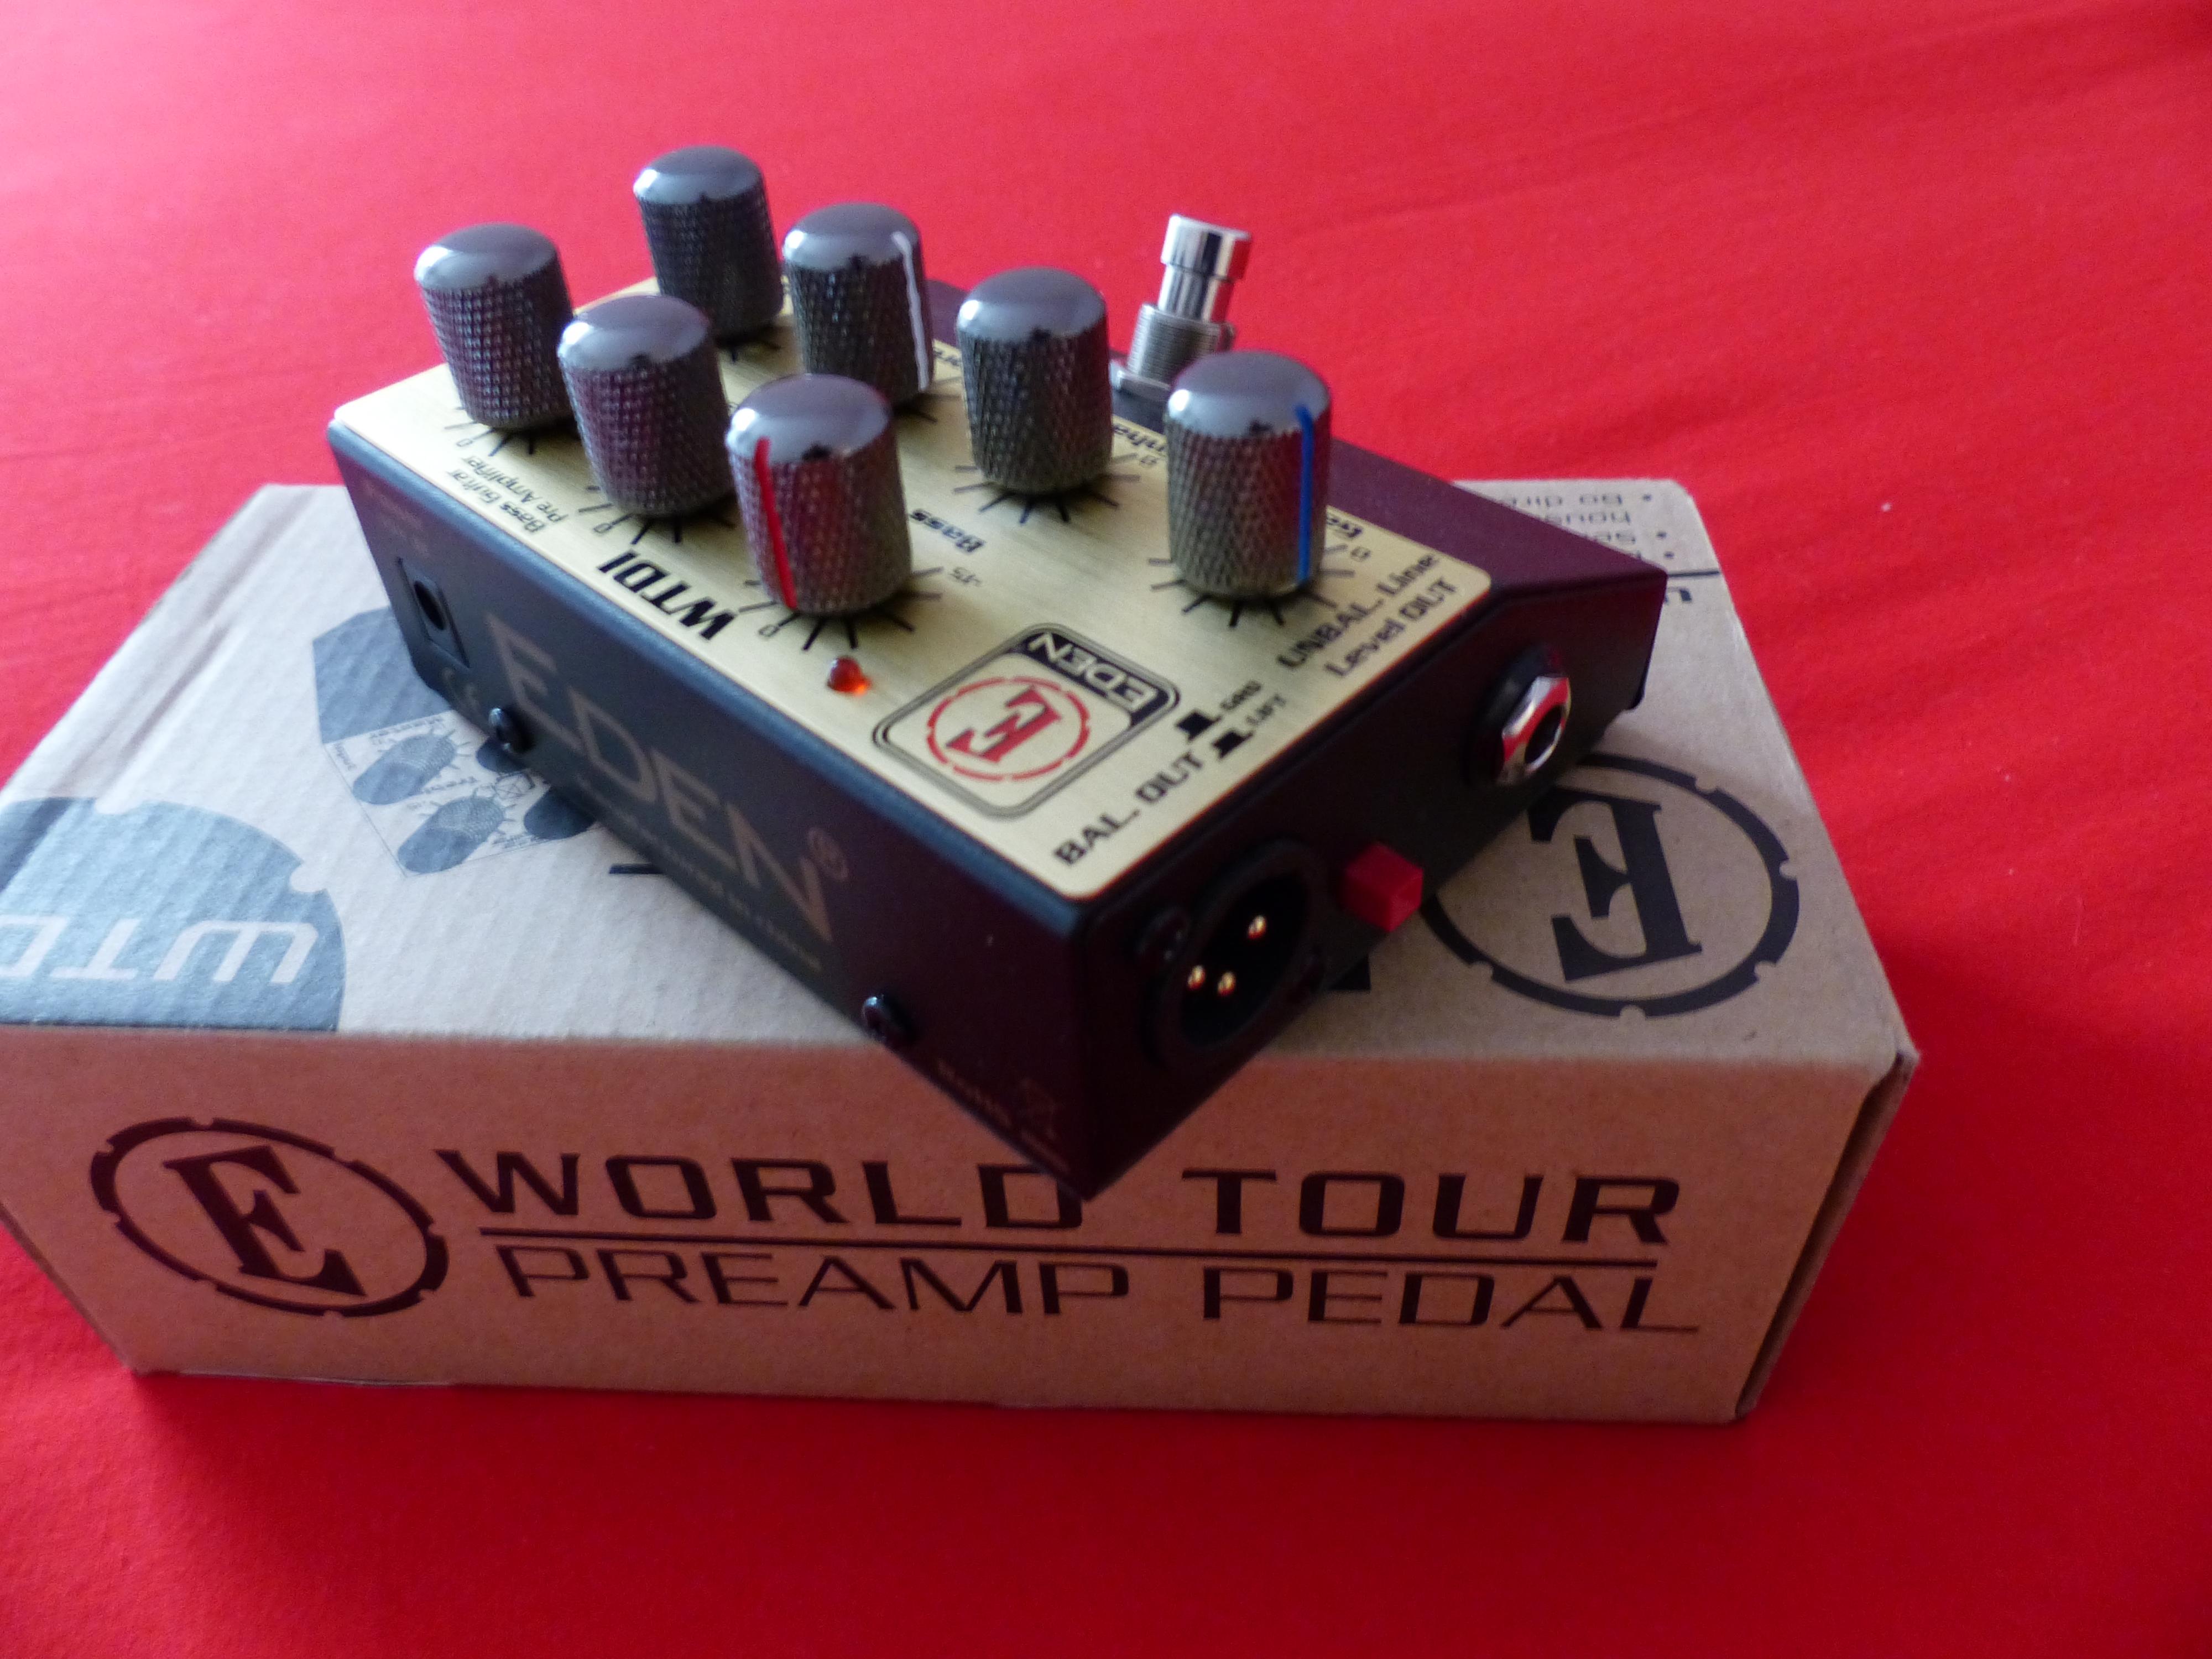 eden bass amplification wtdi direct box preamp image 1696941 audiofanzine. Black Bedroom Furniture Sets. Home Design Ideas